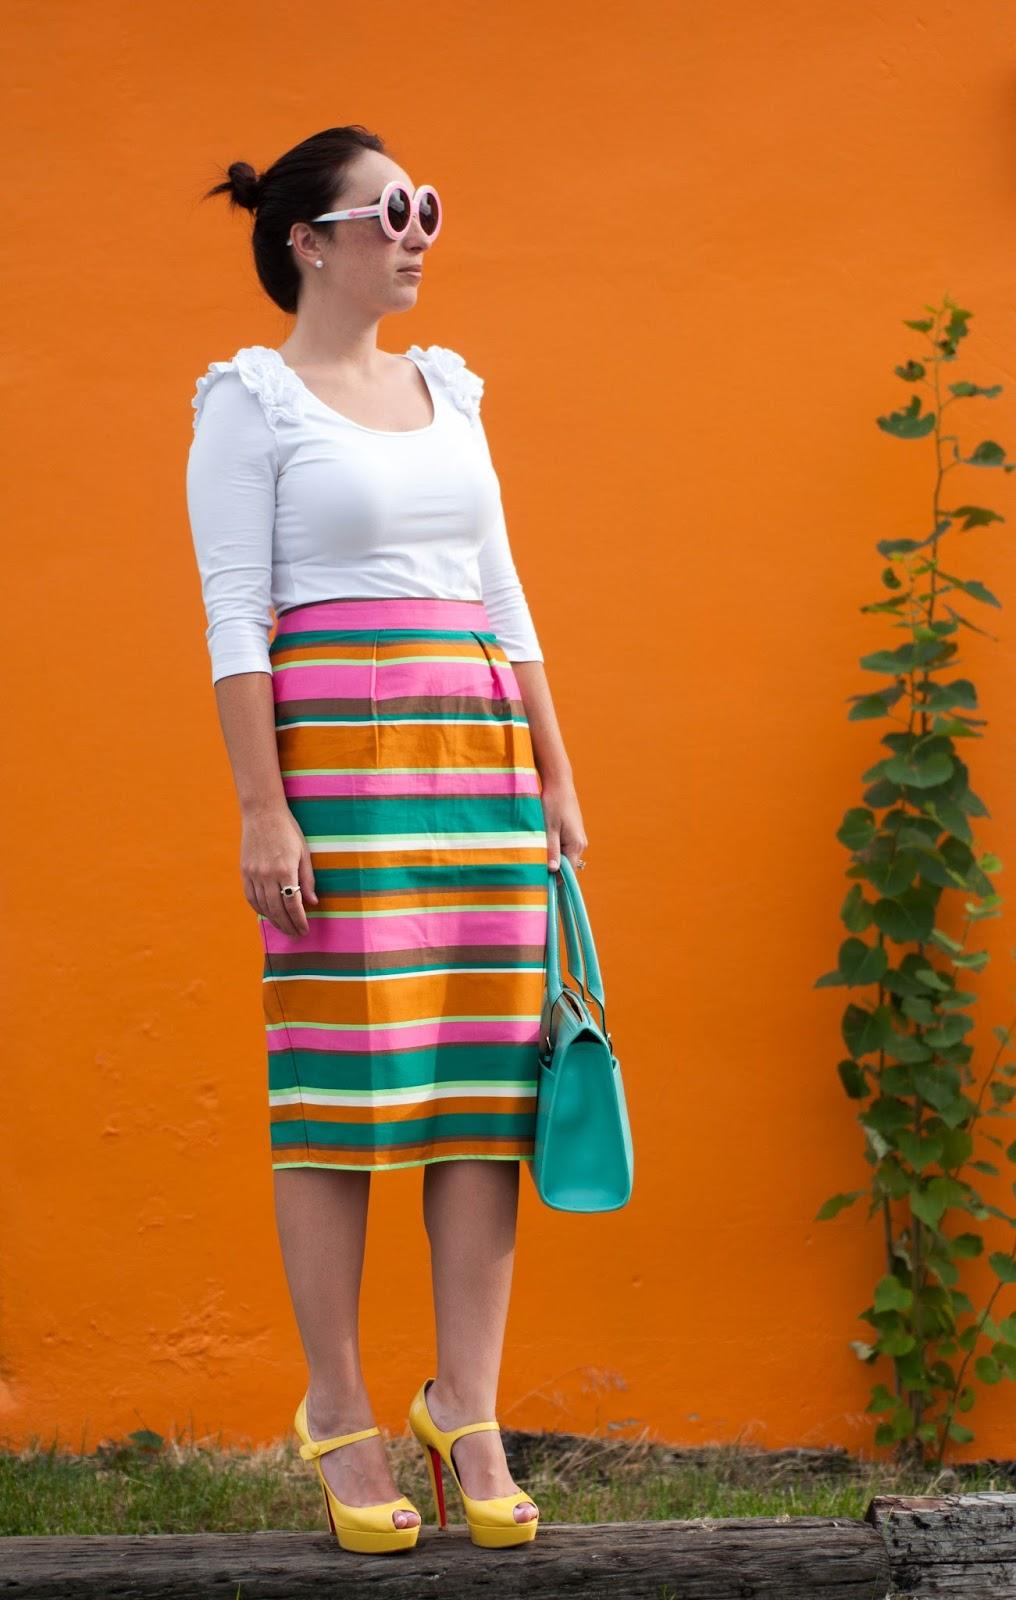 ootd, fashion blog, style blogger, karen walker iris sunglasses, red soles, yellow christian louboutin heels,